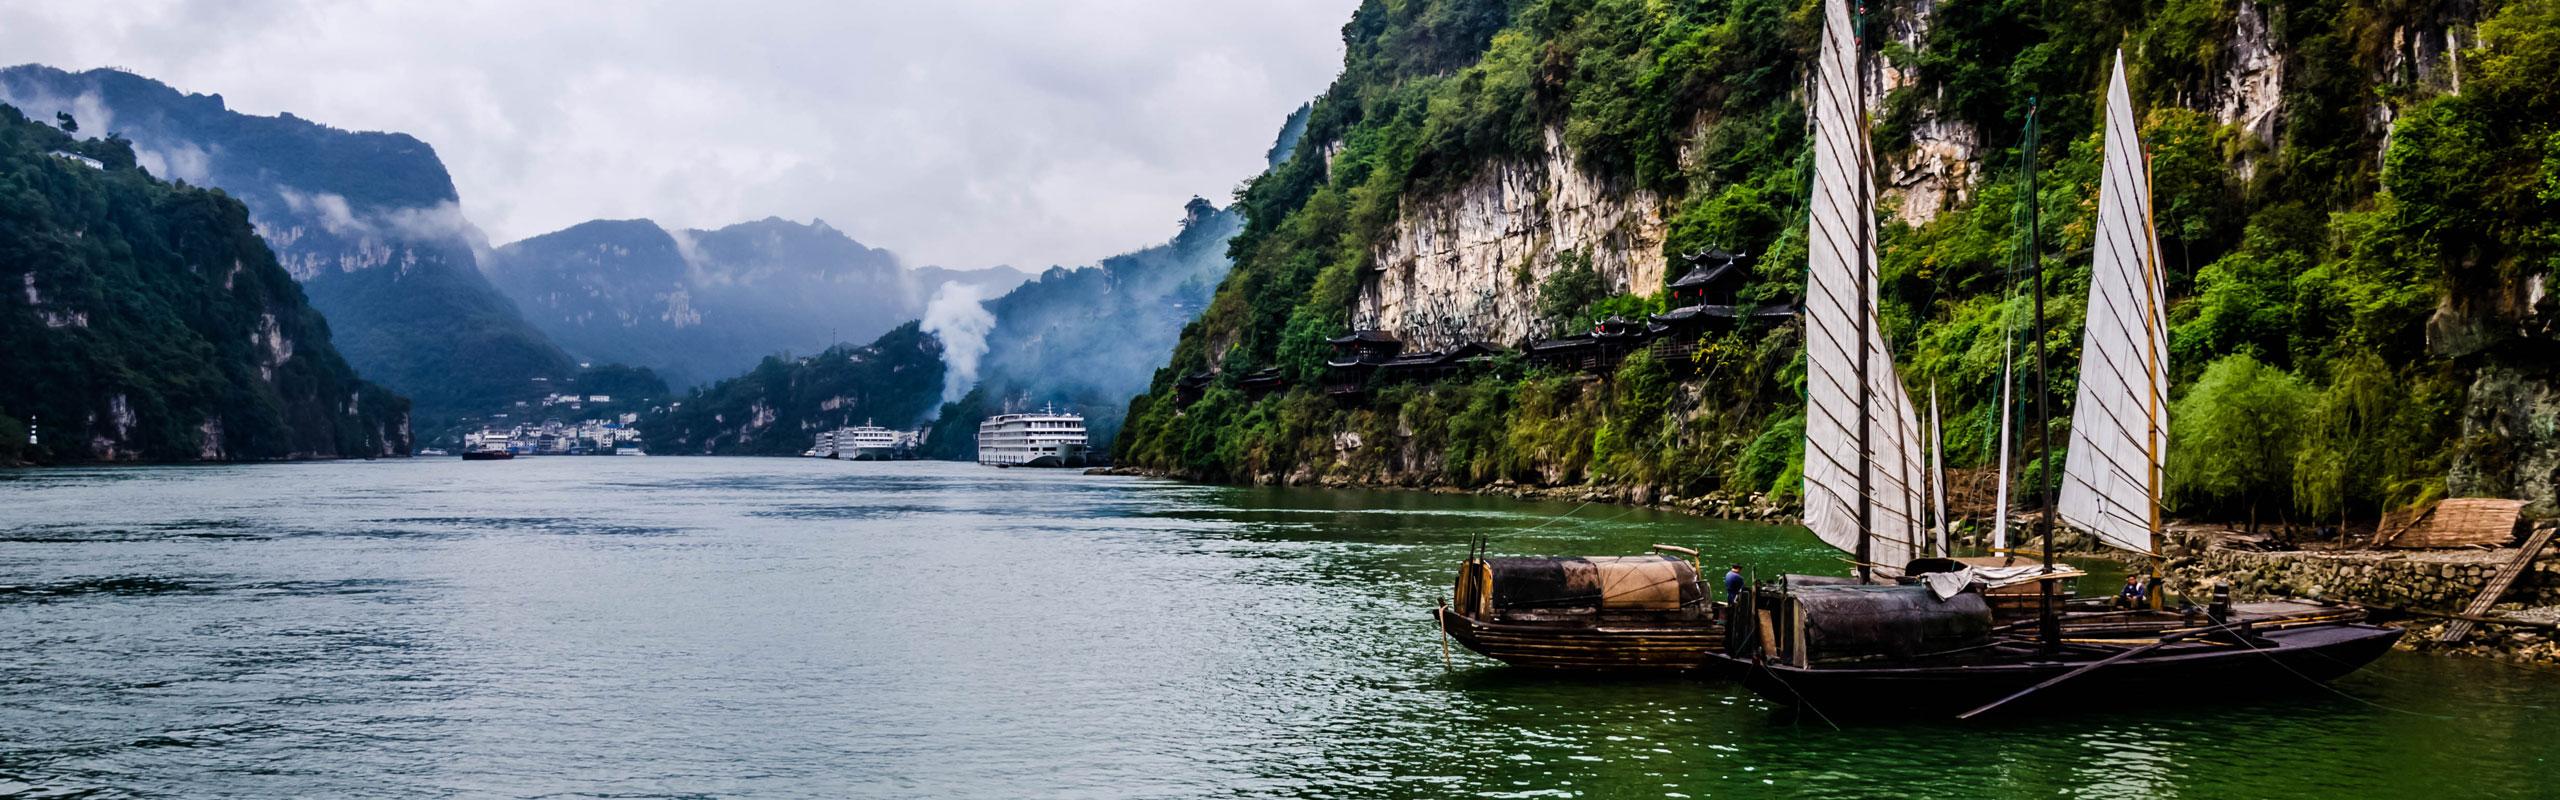 12-Day Beijing, Xi'an, Yangtze River, and Shanghai Tour